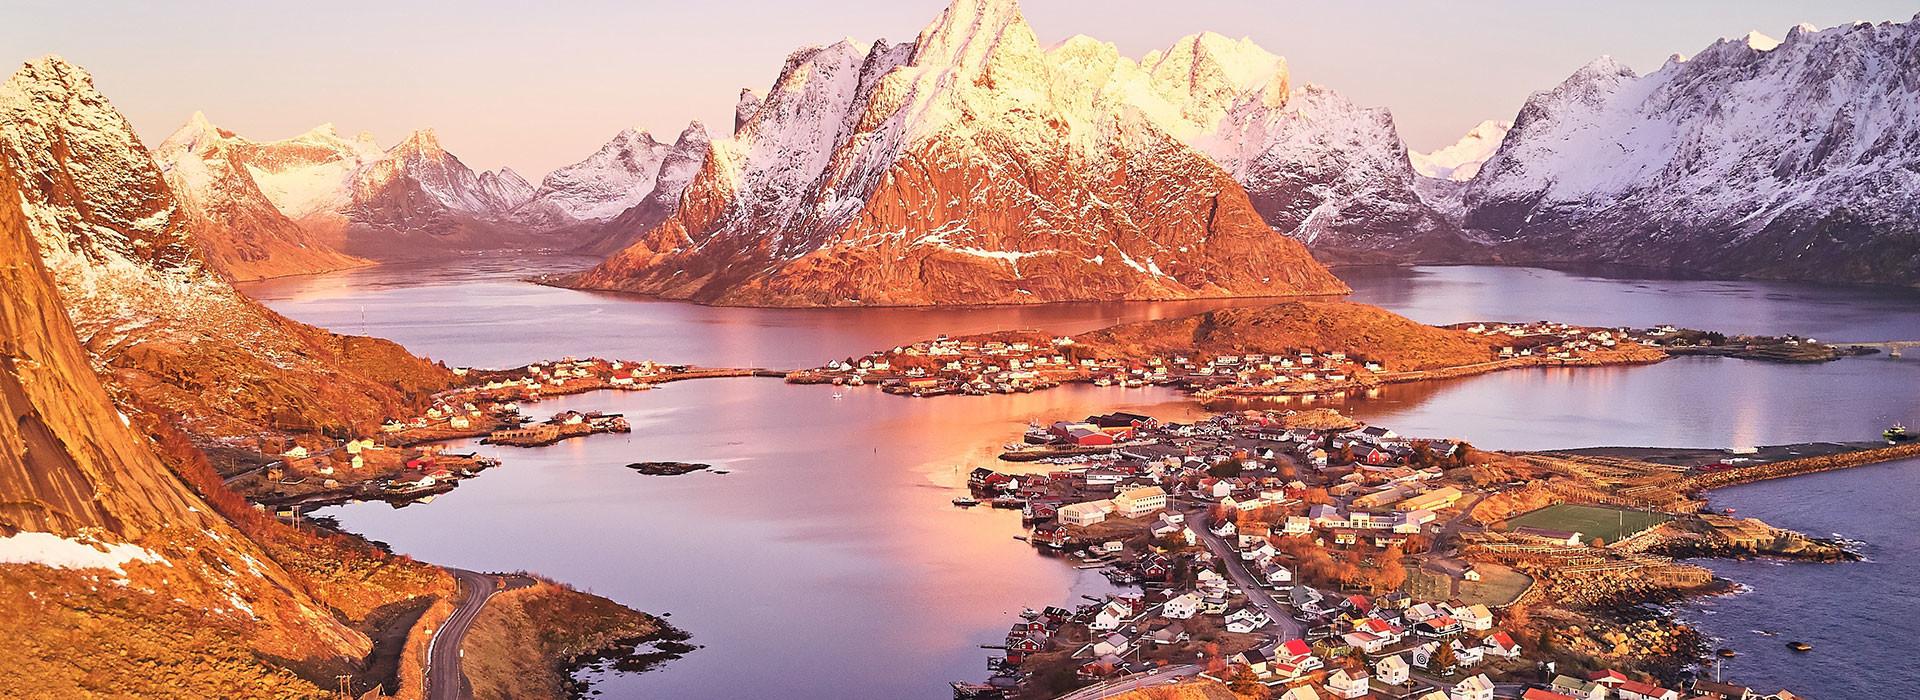 NORVEGIA: FIORDI E ISOLE LOFOTEN